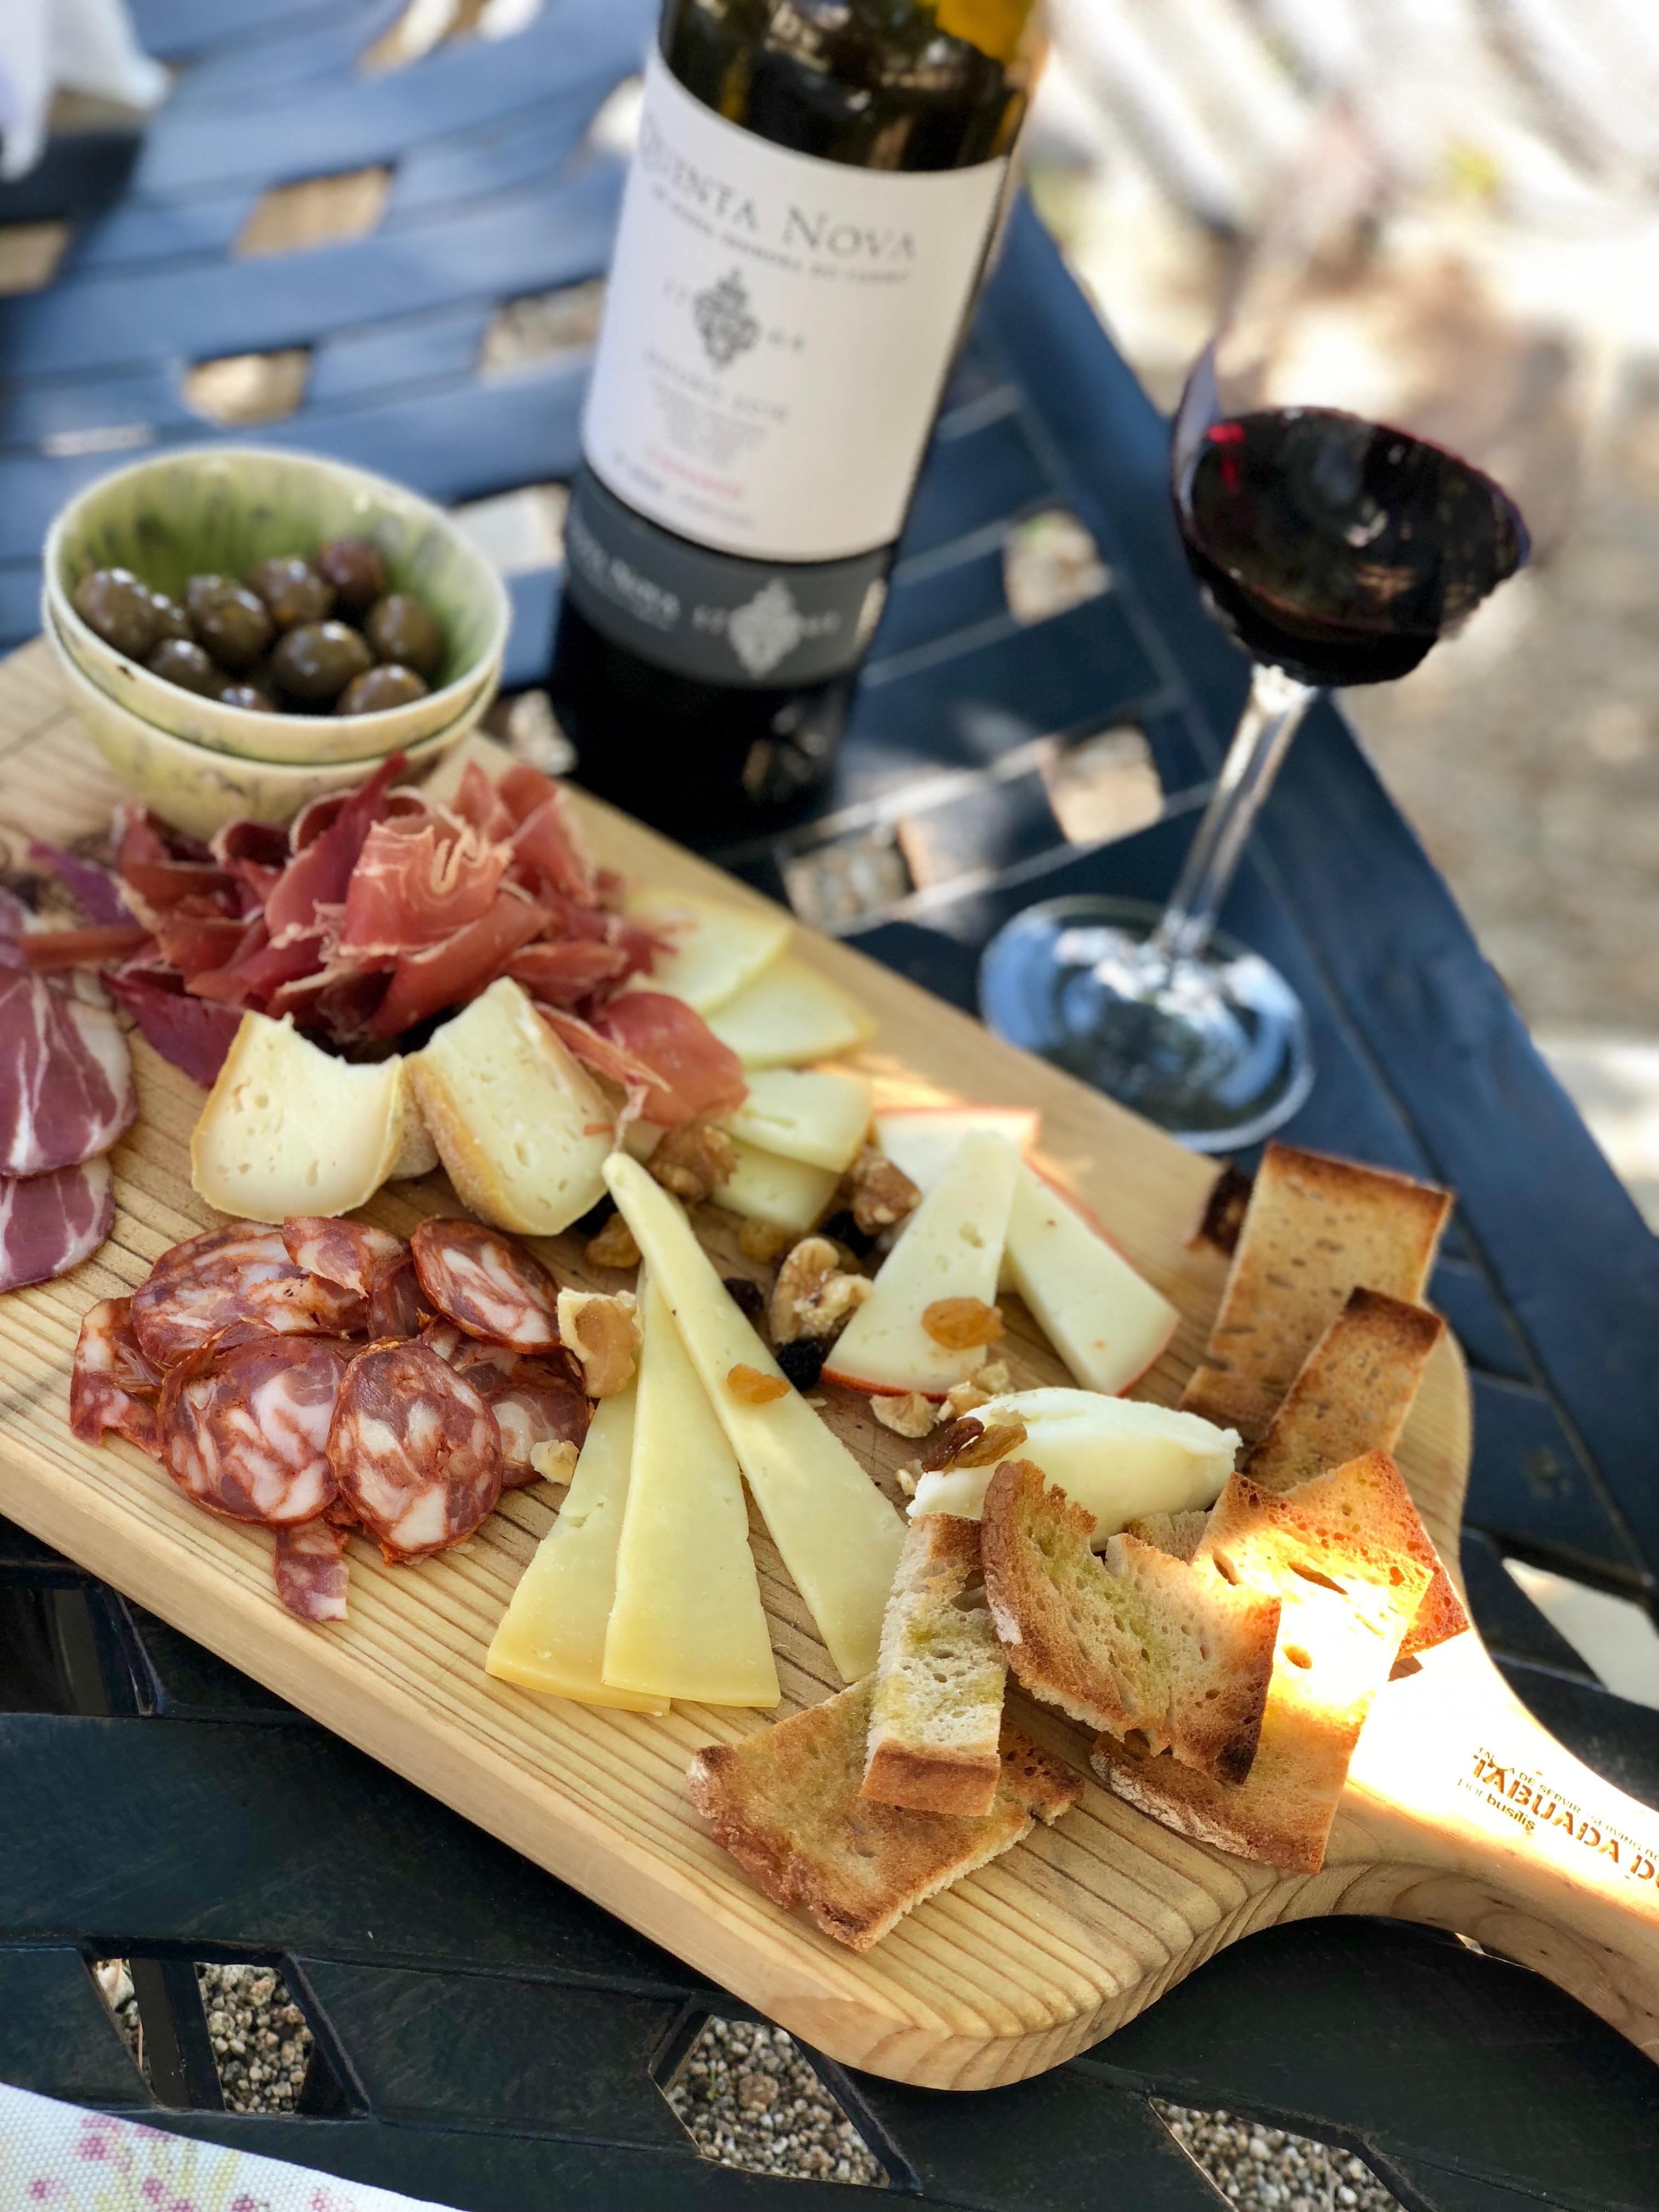 cristina nogueras photography portugal douro quinta nova wine and cheese vacation